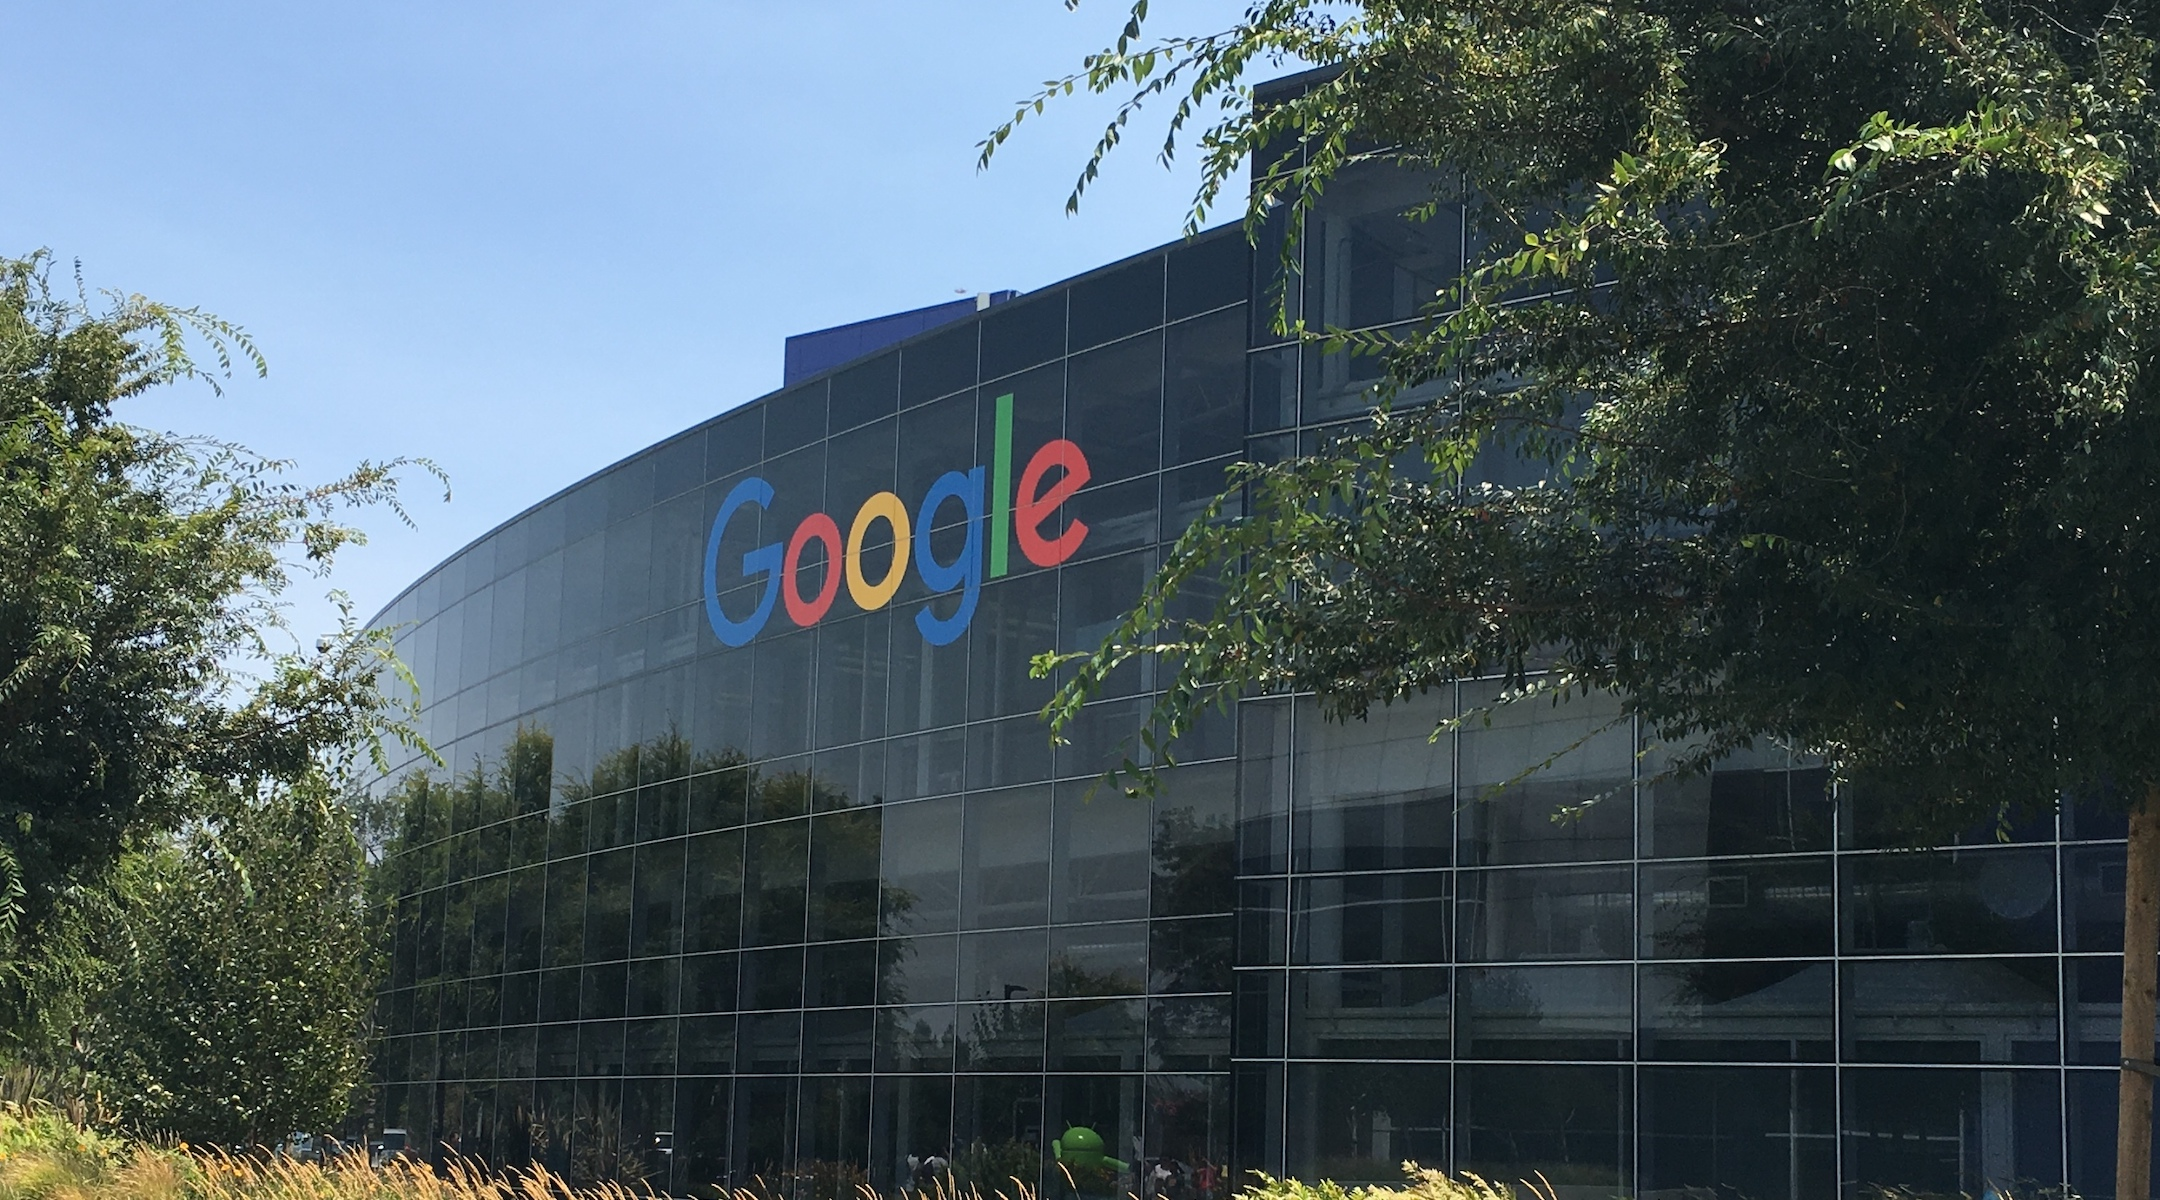 Google headquarters in Mountain View. (Photo/JTA-Wikimedia Commons)